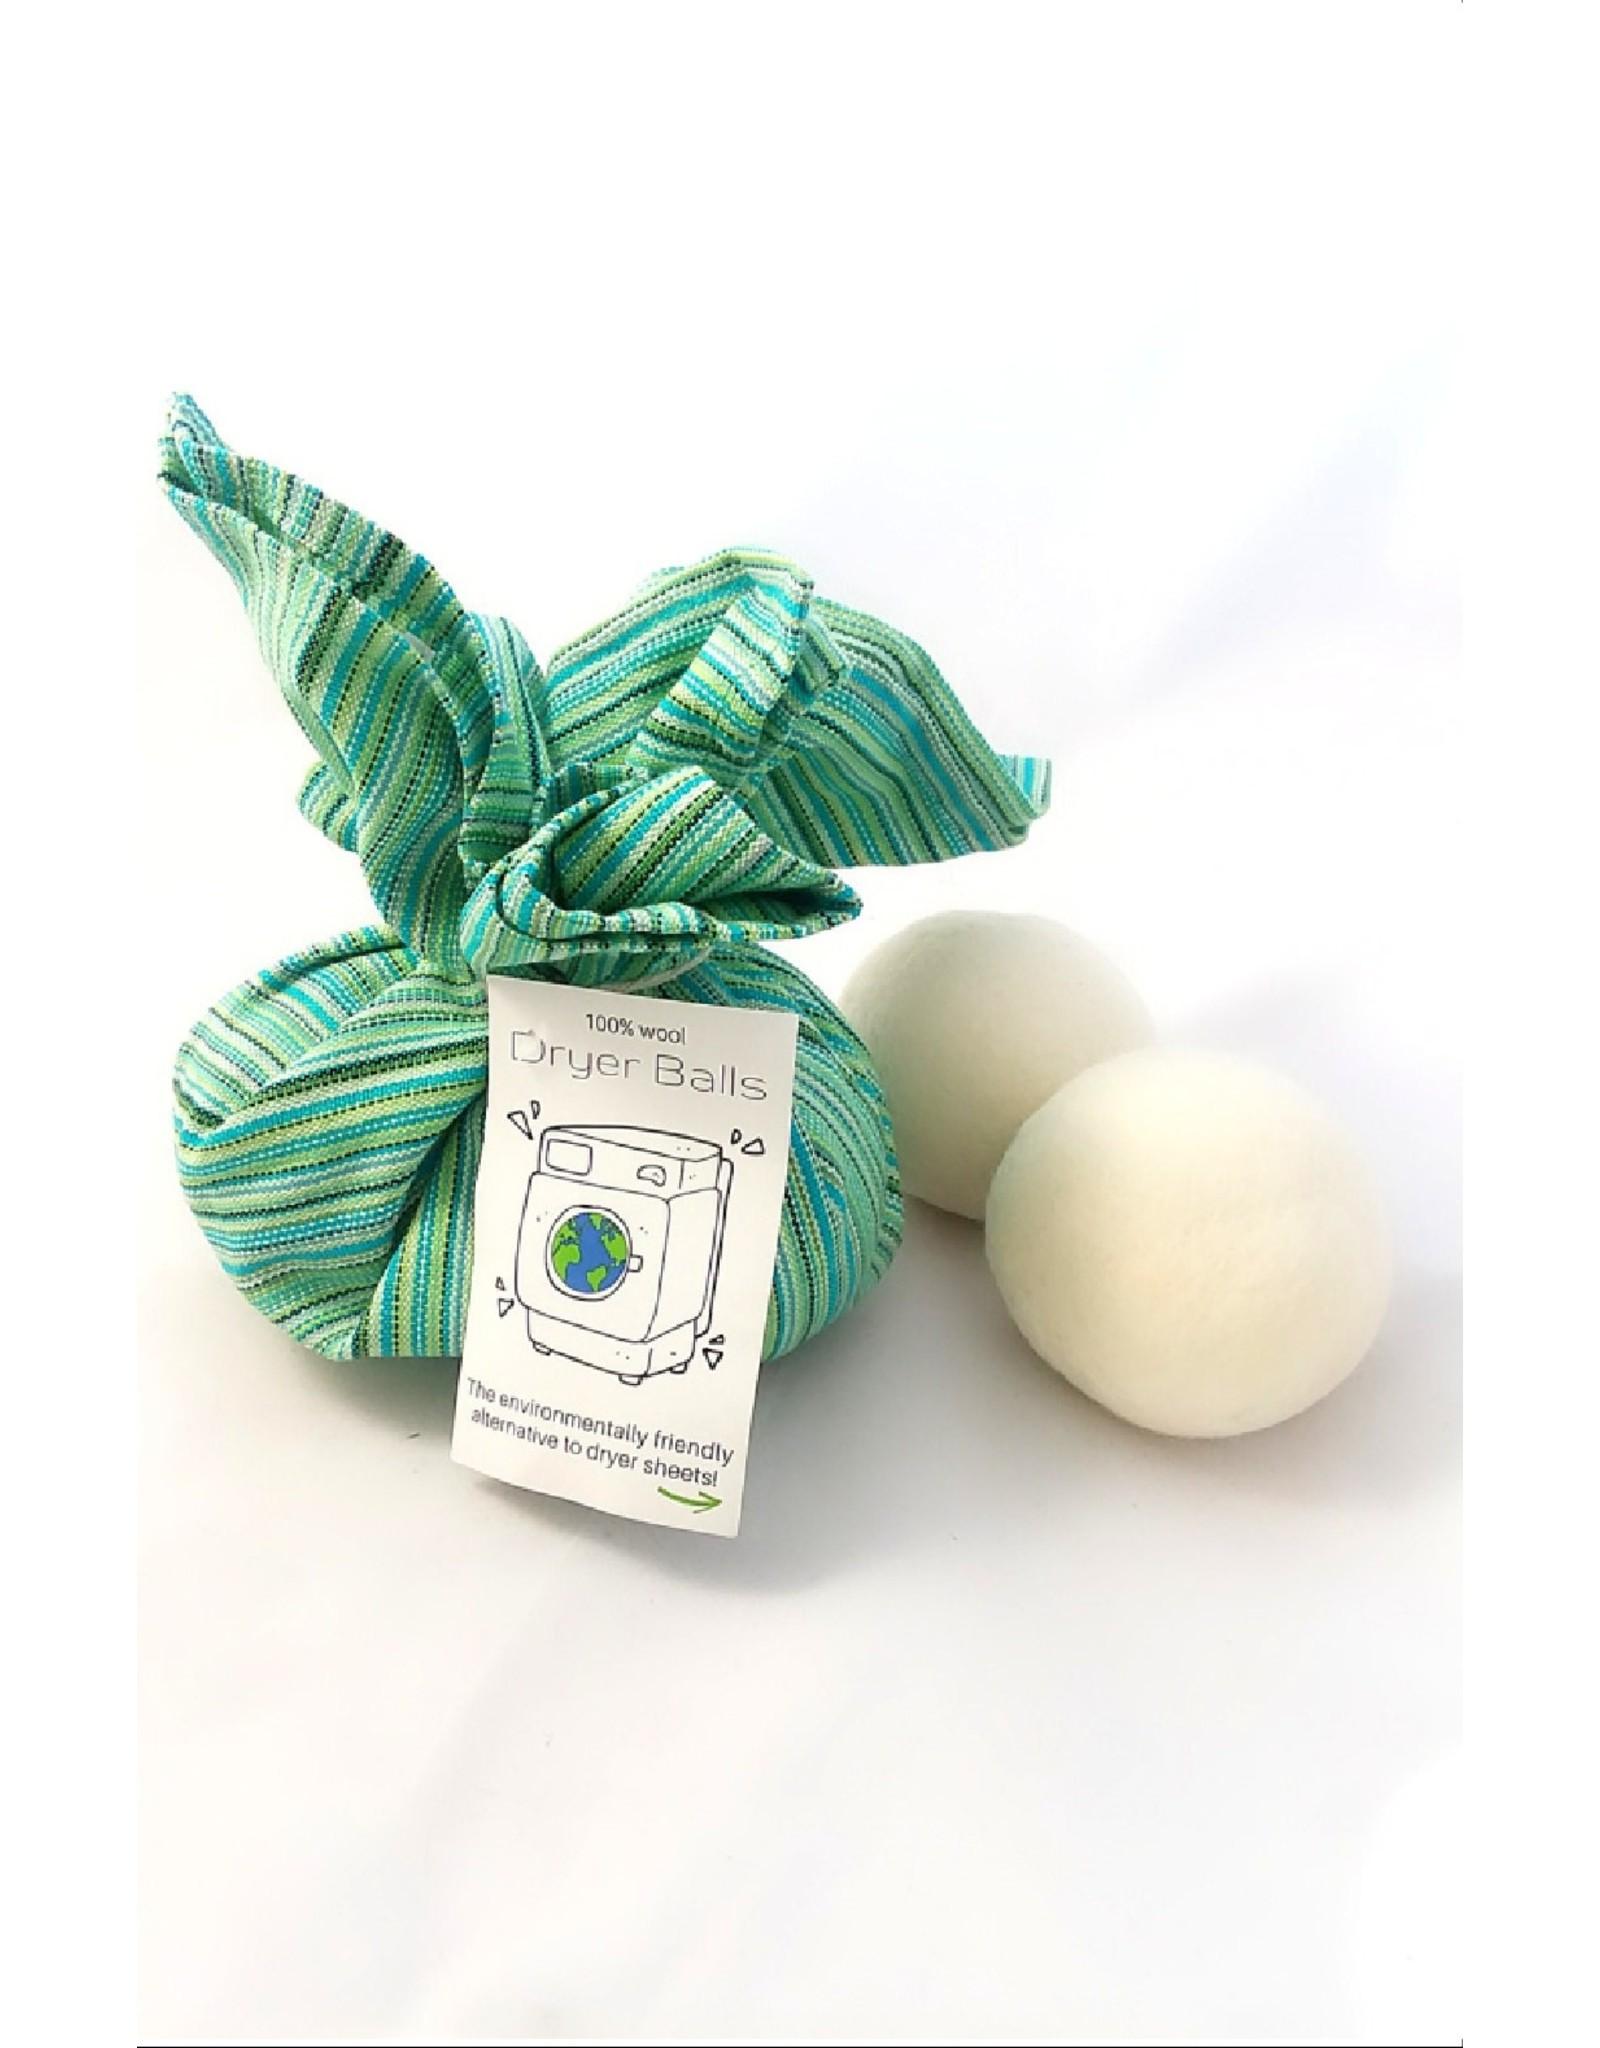 Ganesh Himal Wool Felt Dryer Balls, gift set w/ teatowel